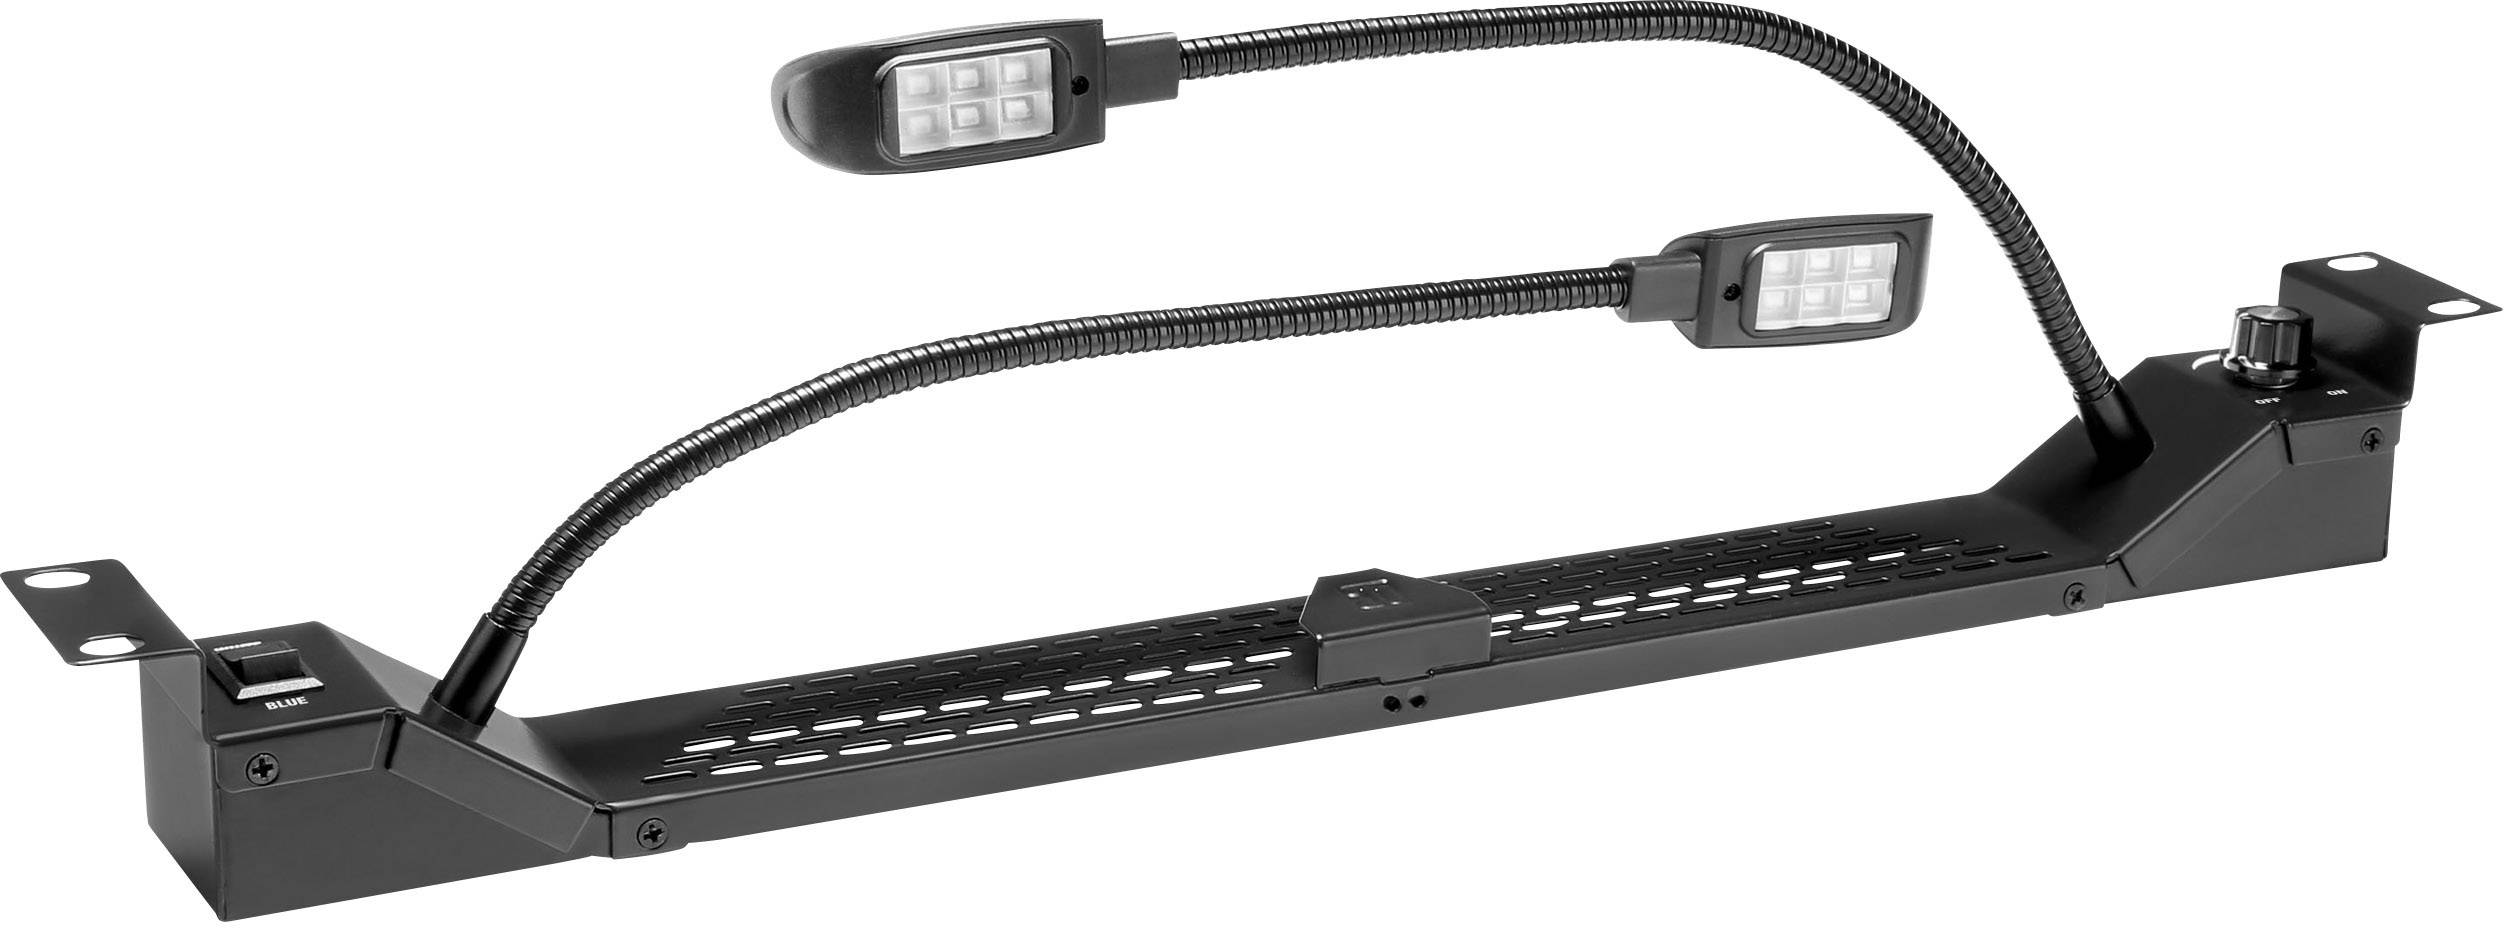 "LED lampa na osvetlenie racku 48,3 cm (19"") LD Systems 87463, 1 U"